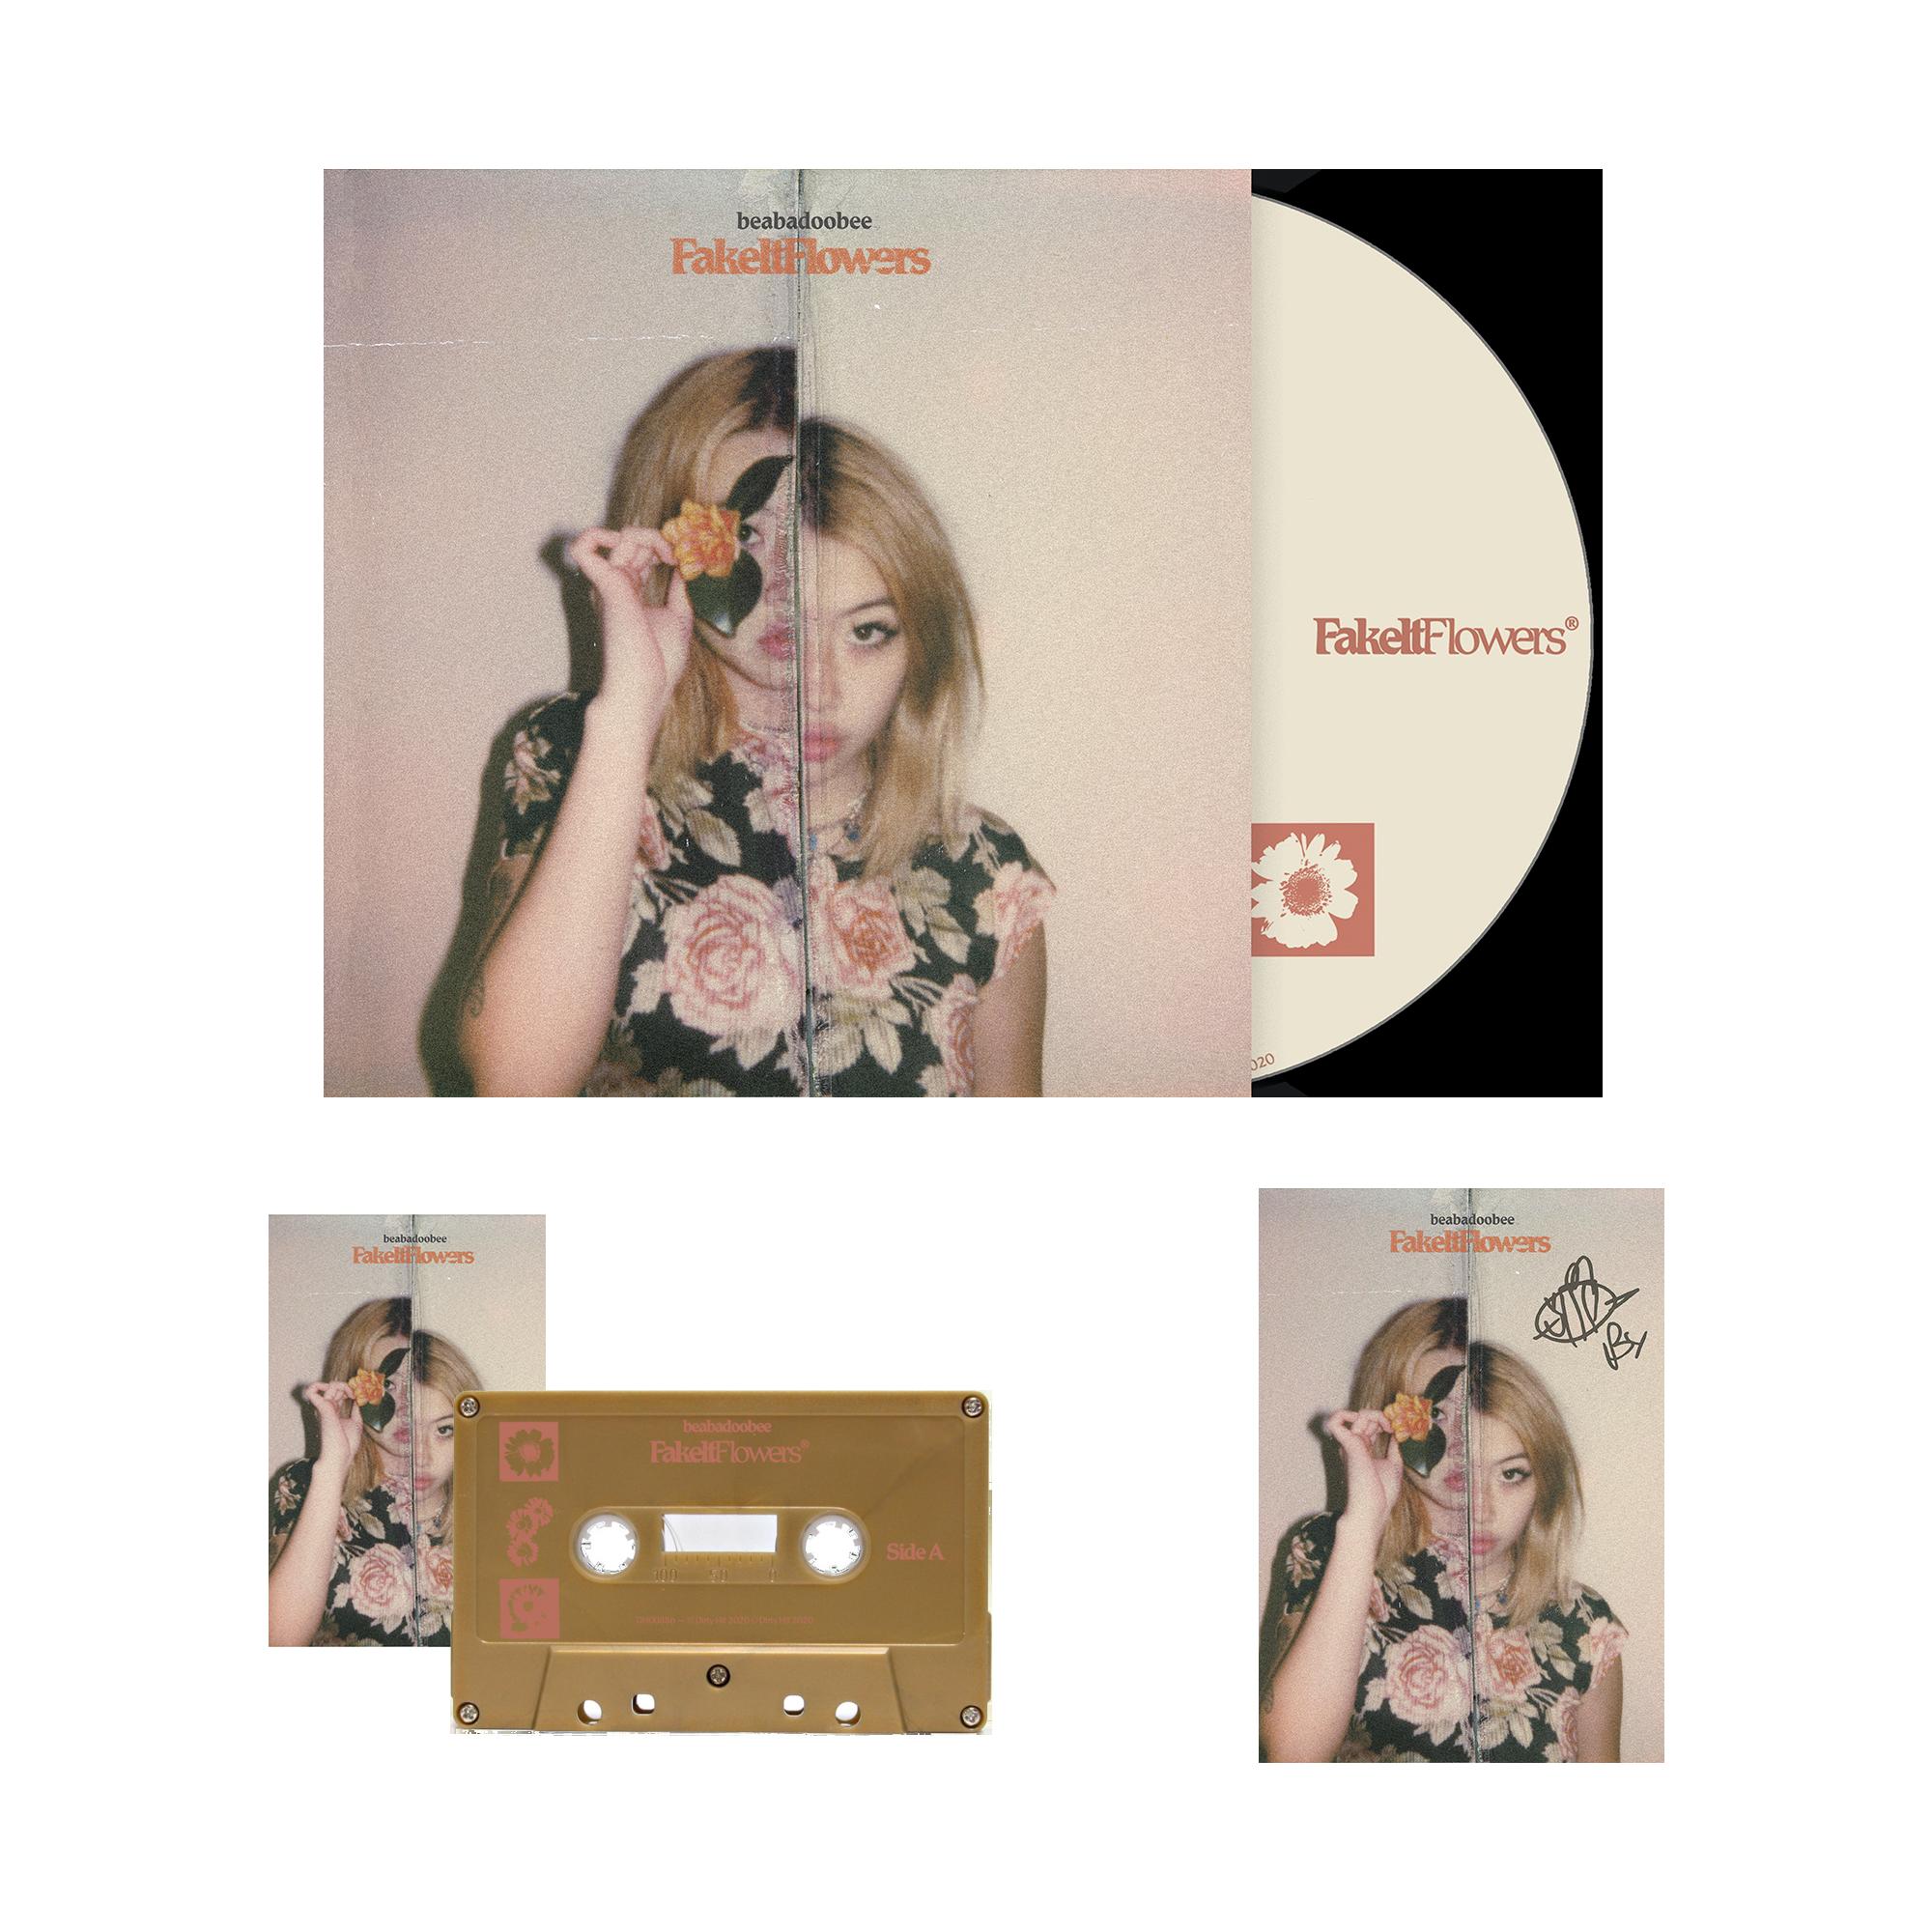 Beabadoobee: Fake It Flowers Gold CD Bundle (Signed)